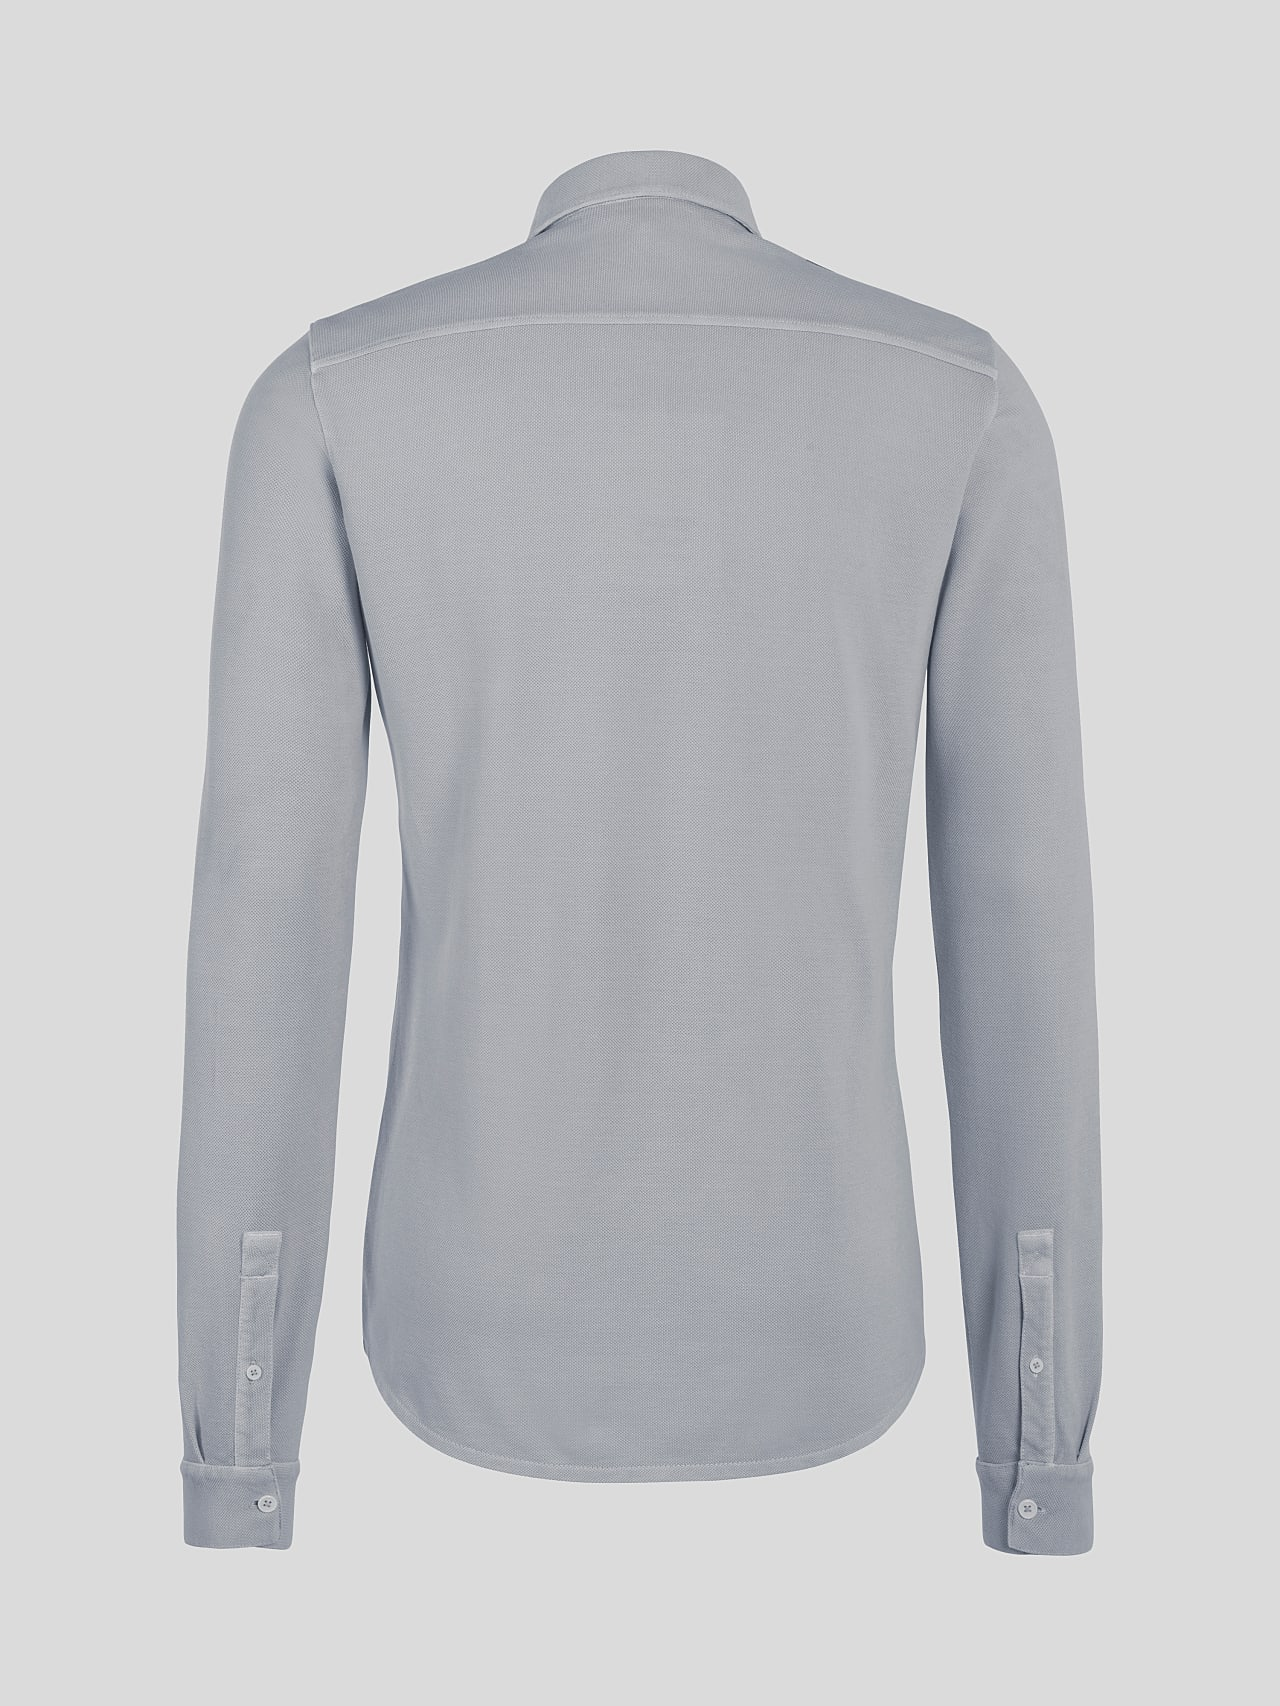 JIQUE V1.Y5.01 Pique Shirt with Kent Collar light grey Left Alpha Tauri